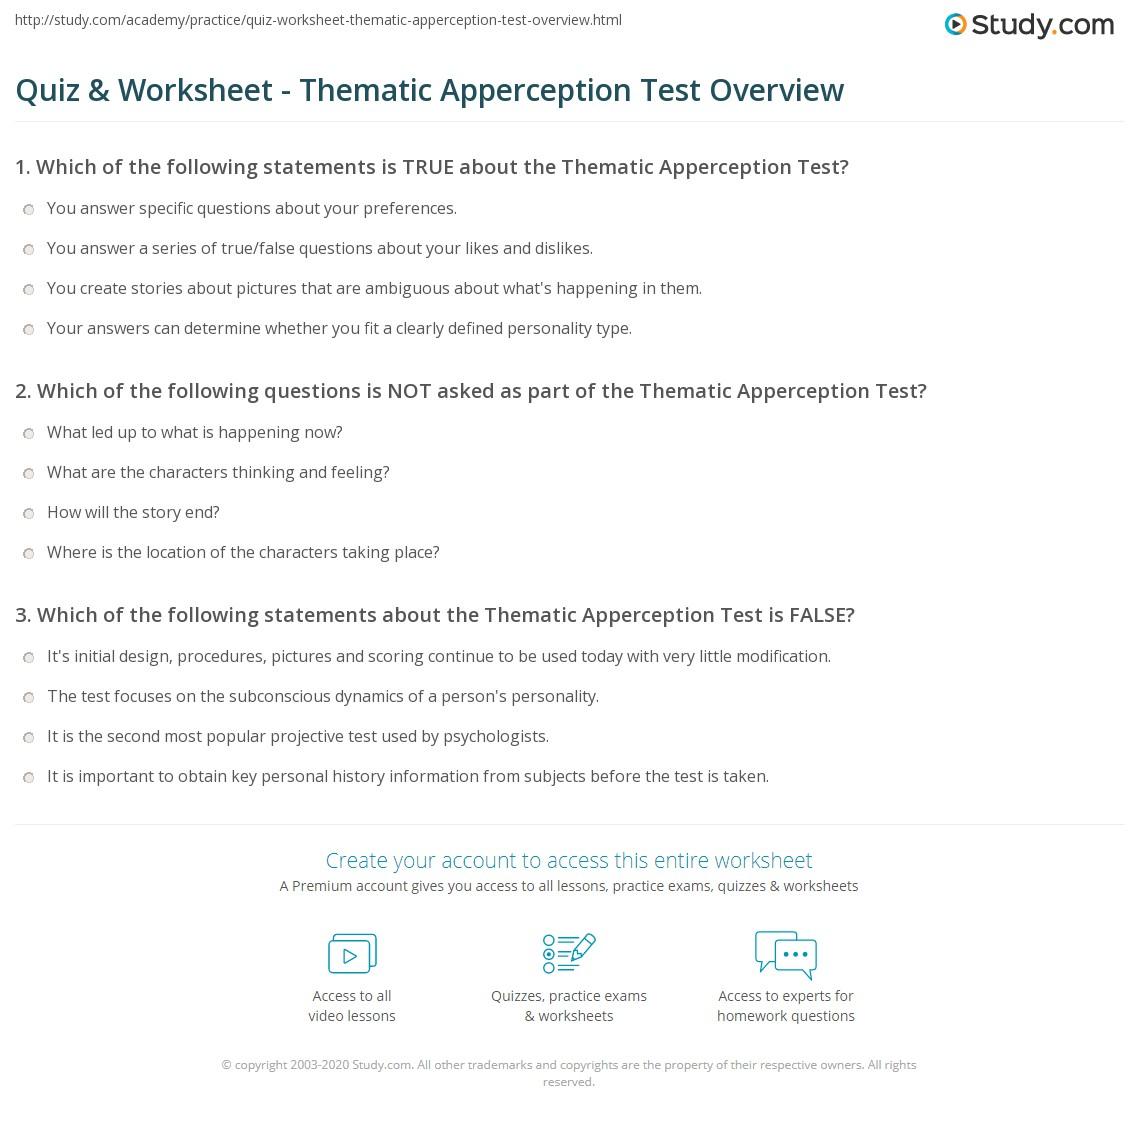 thematic apperception test interpretation example